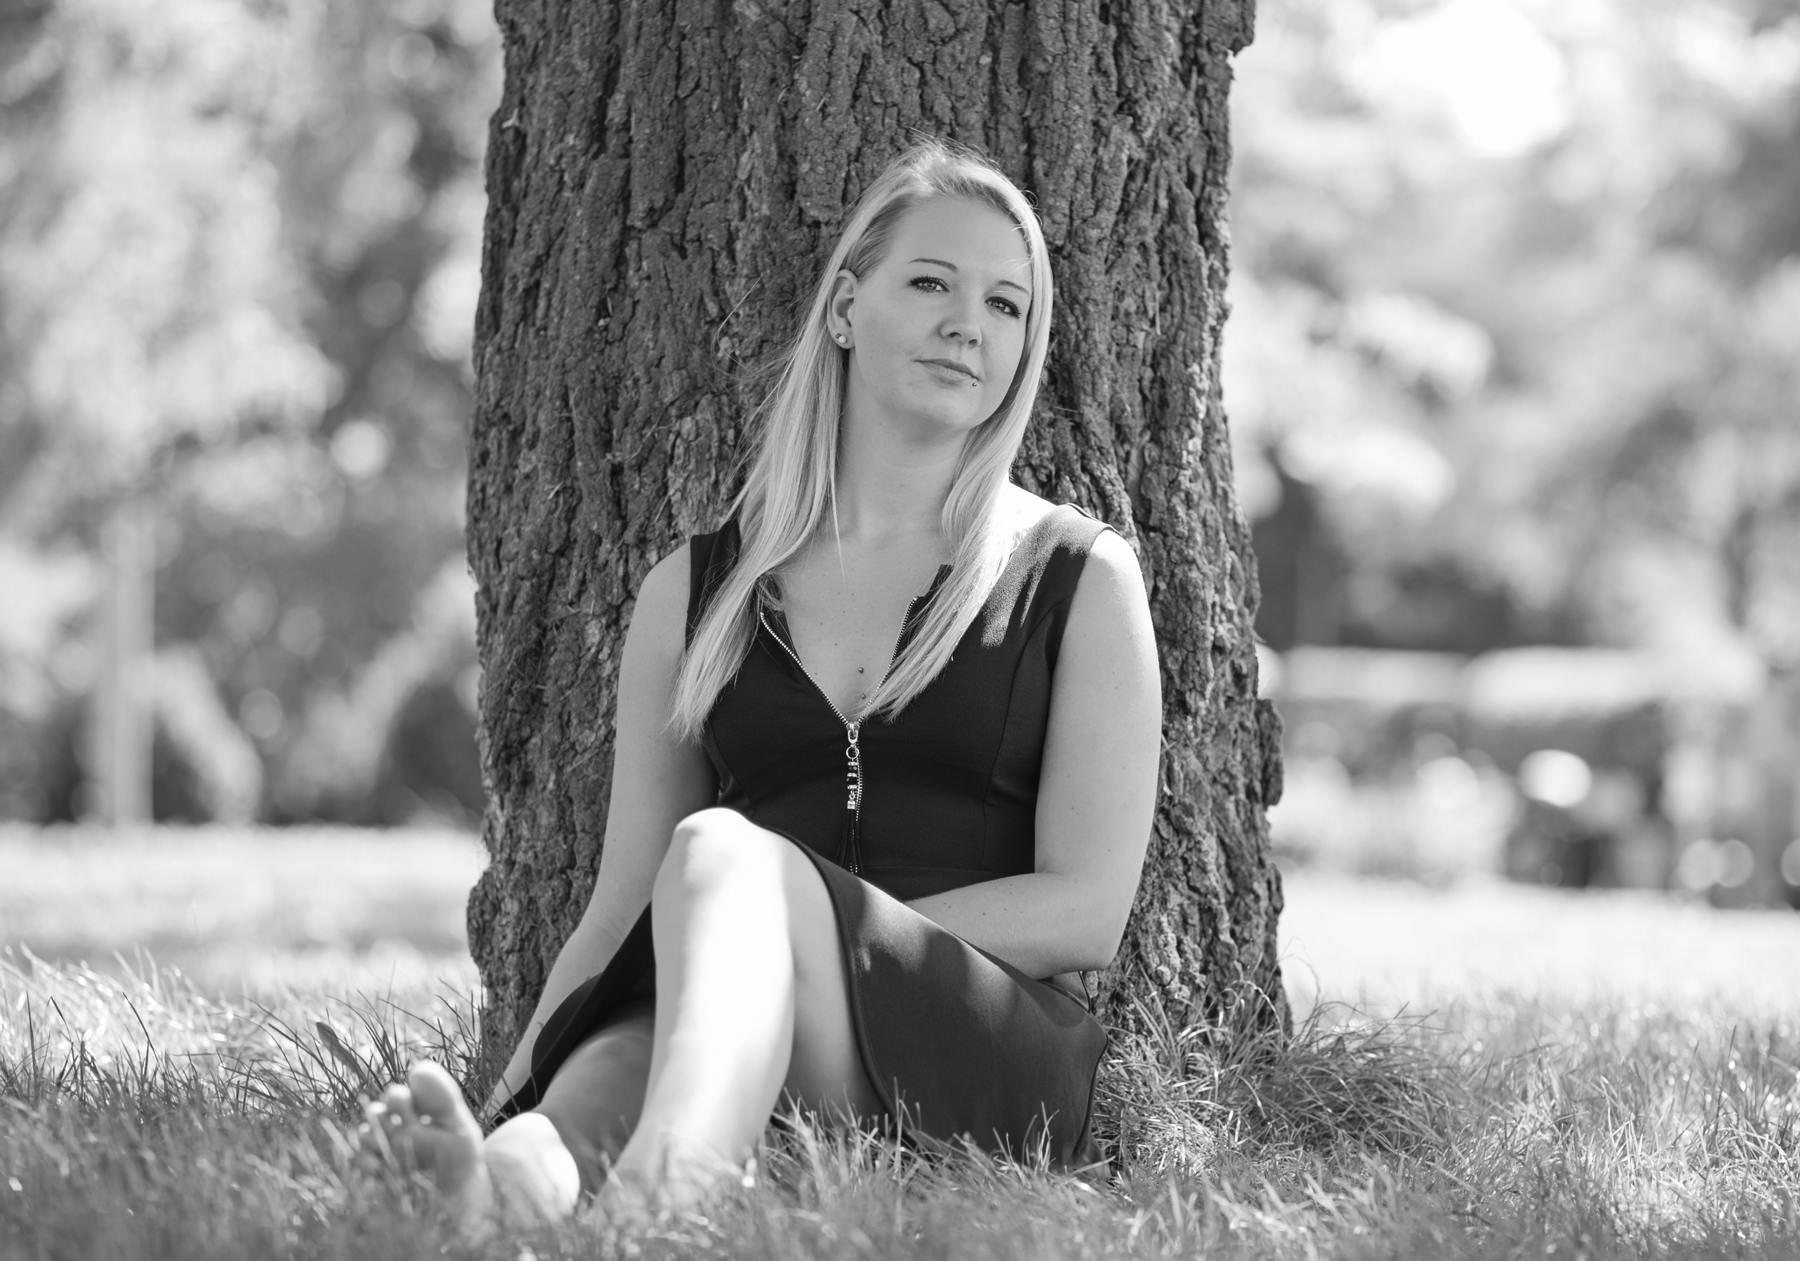 momentlichkeiten | Sina Hasenmaile Fotografie | Portrait | Sedcard |